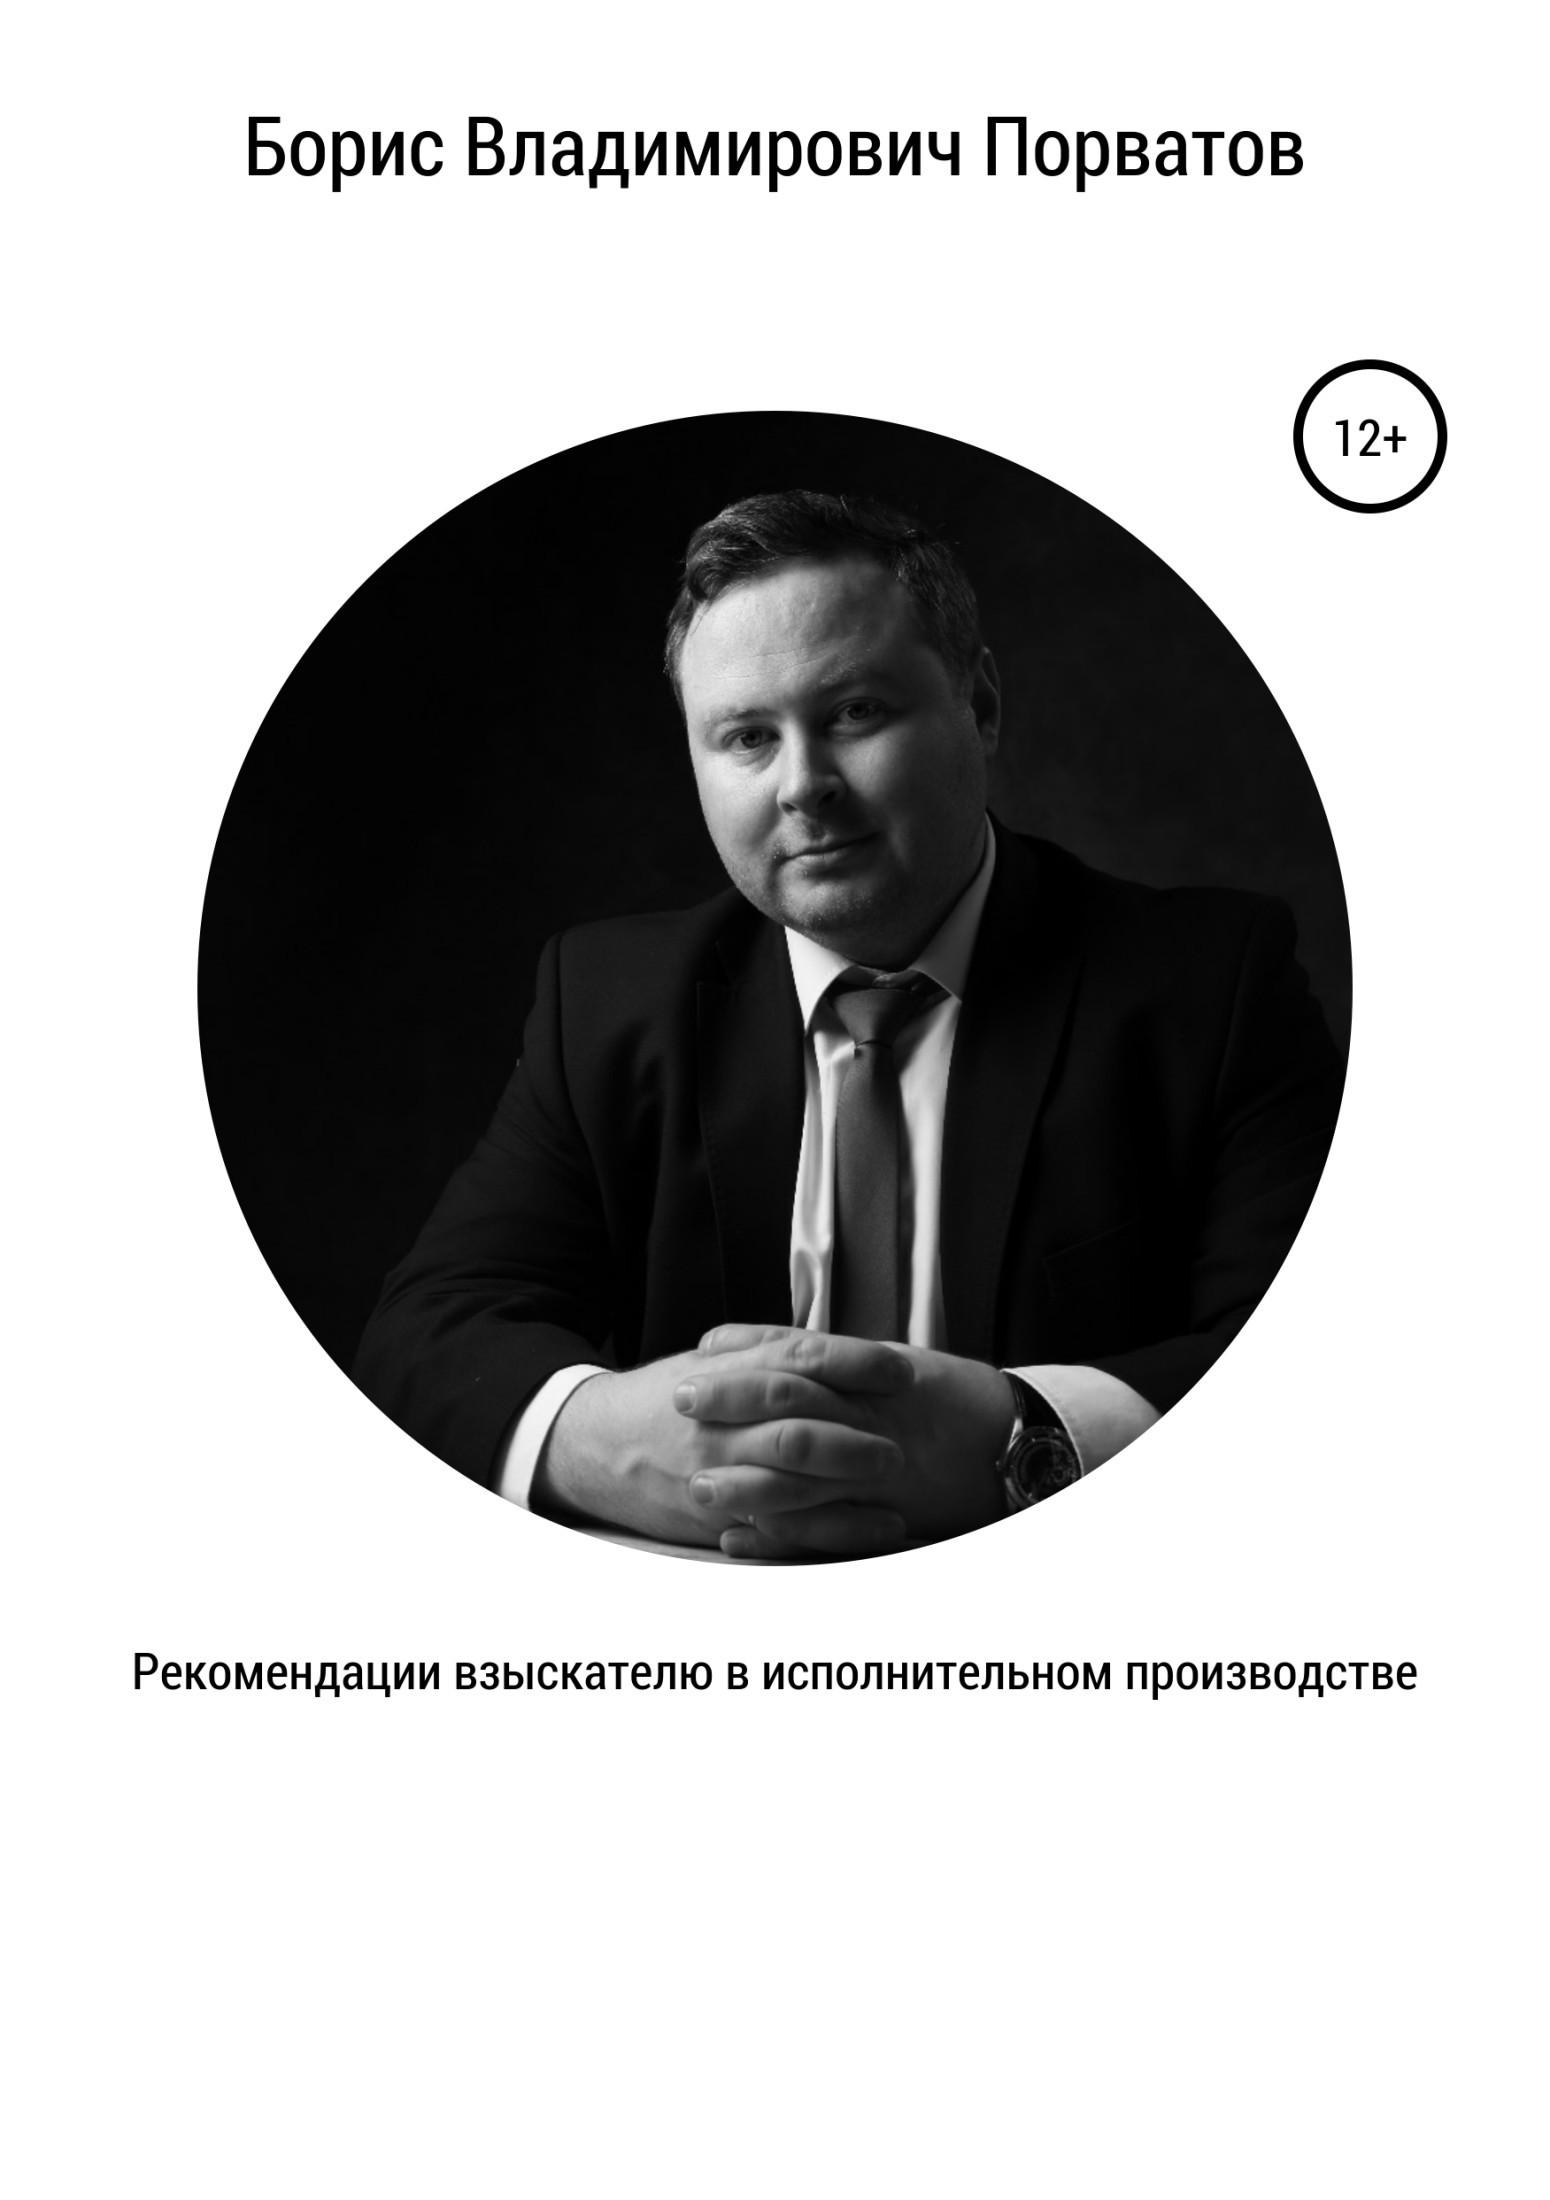 Обложка книги. Автор - Борис Порватов